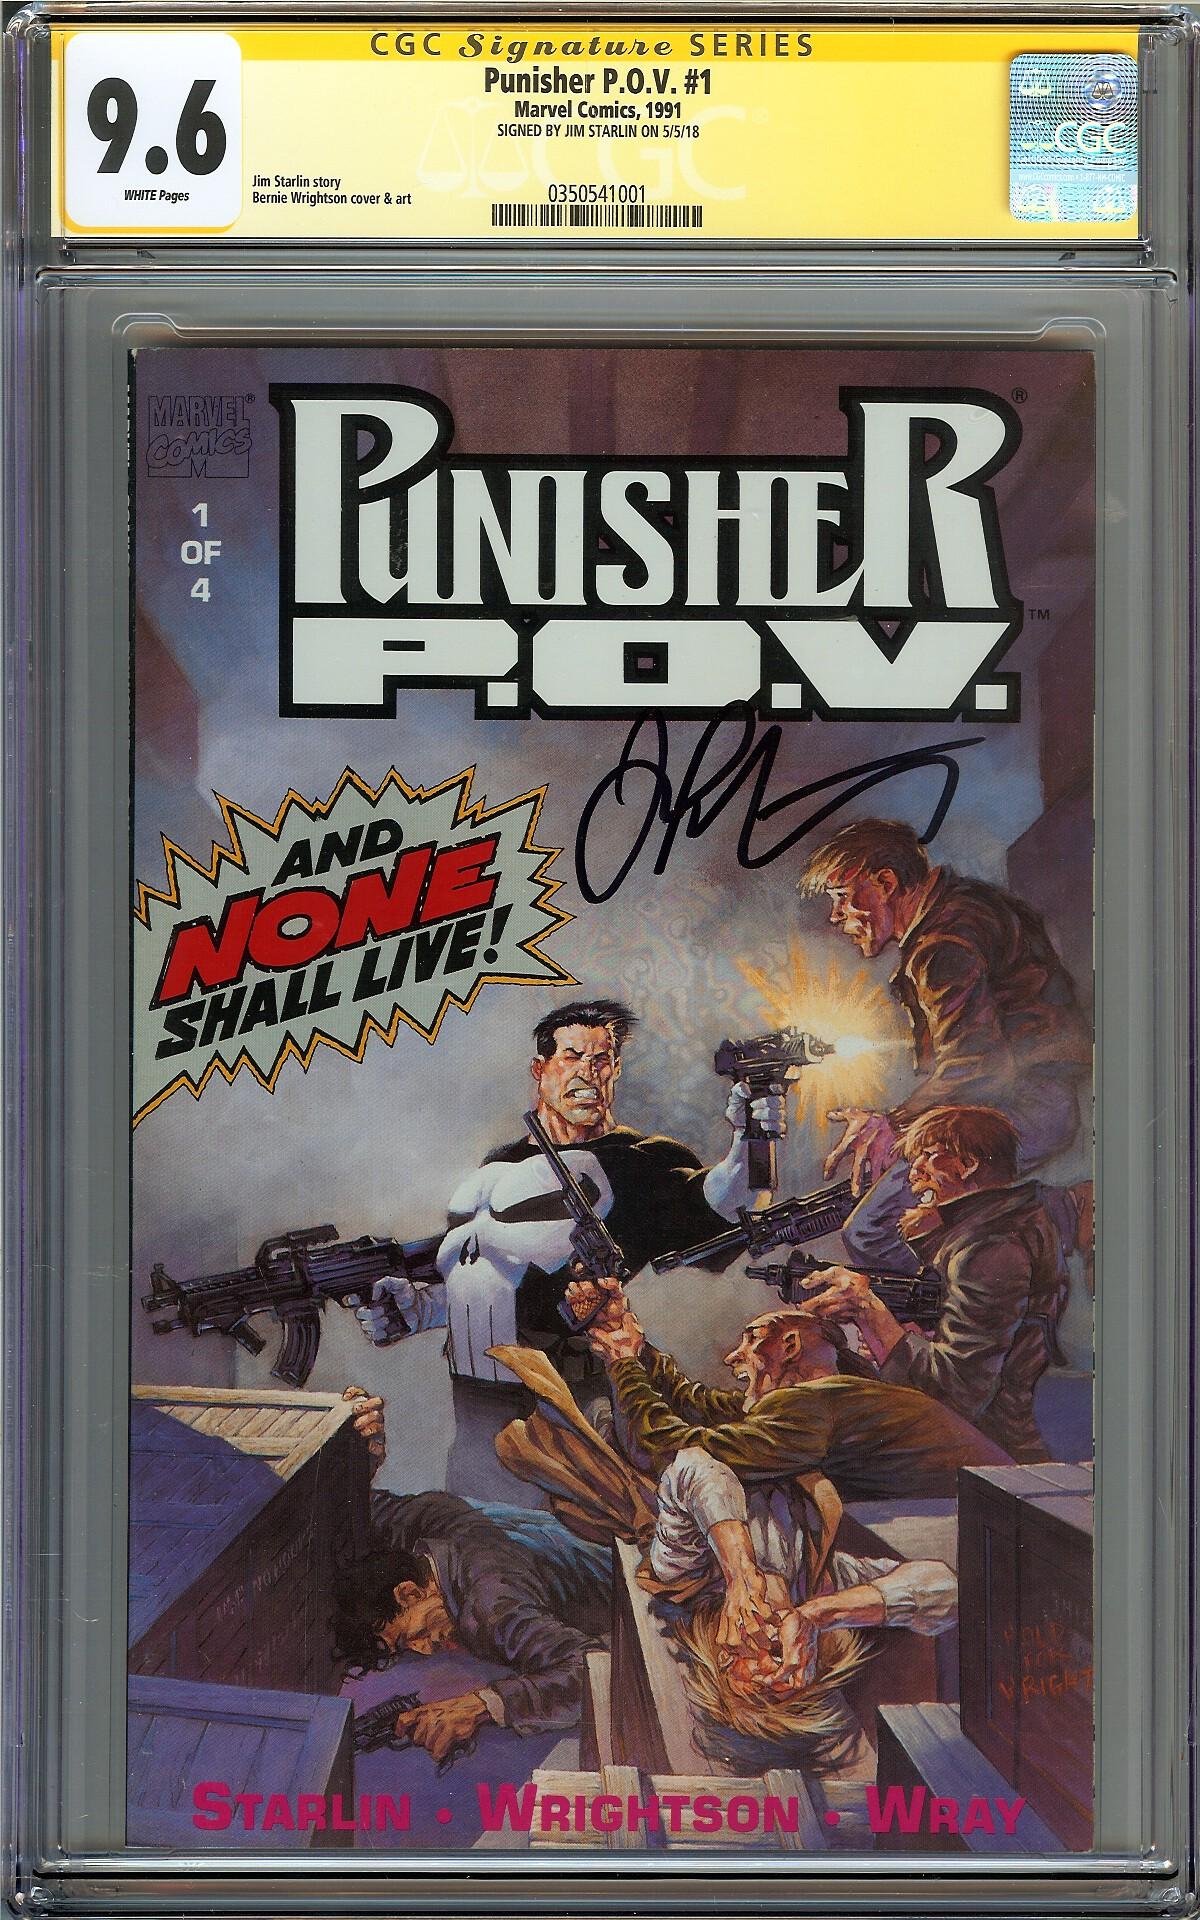 # 3 PUNISHER: P.O.V 1991-9.6 COMIC